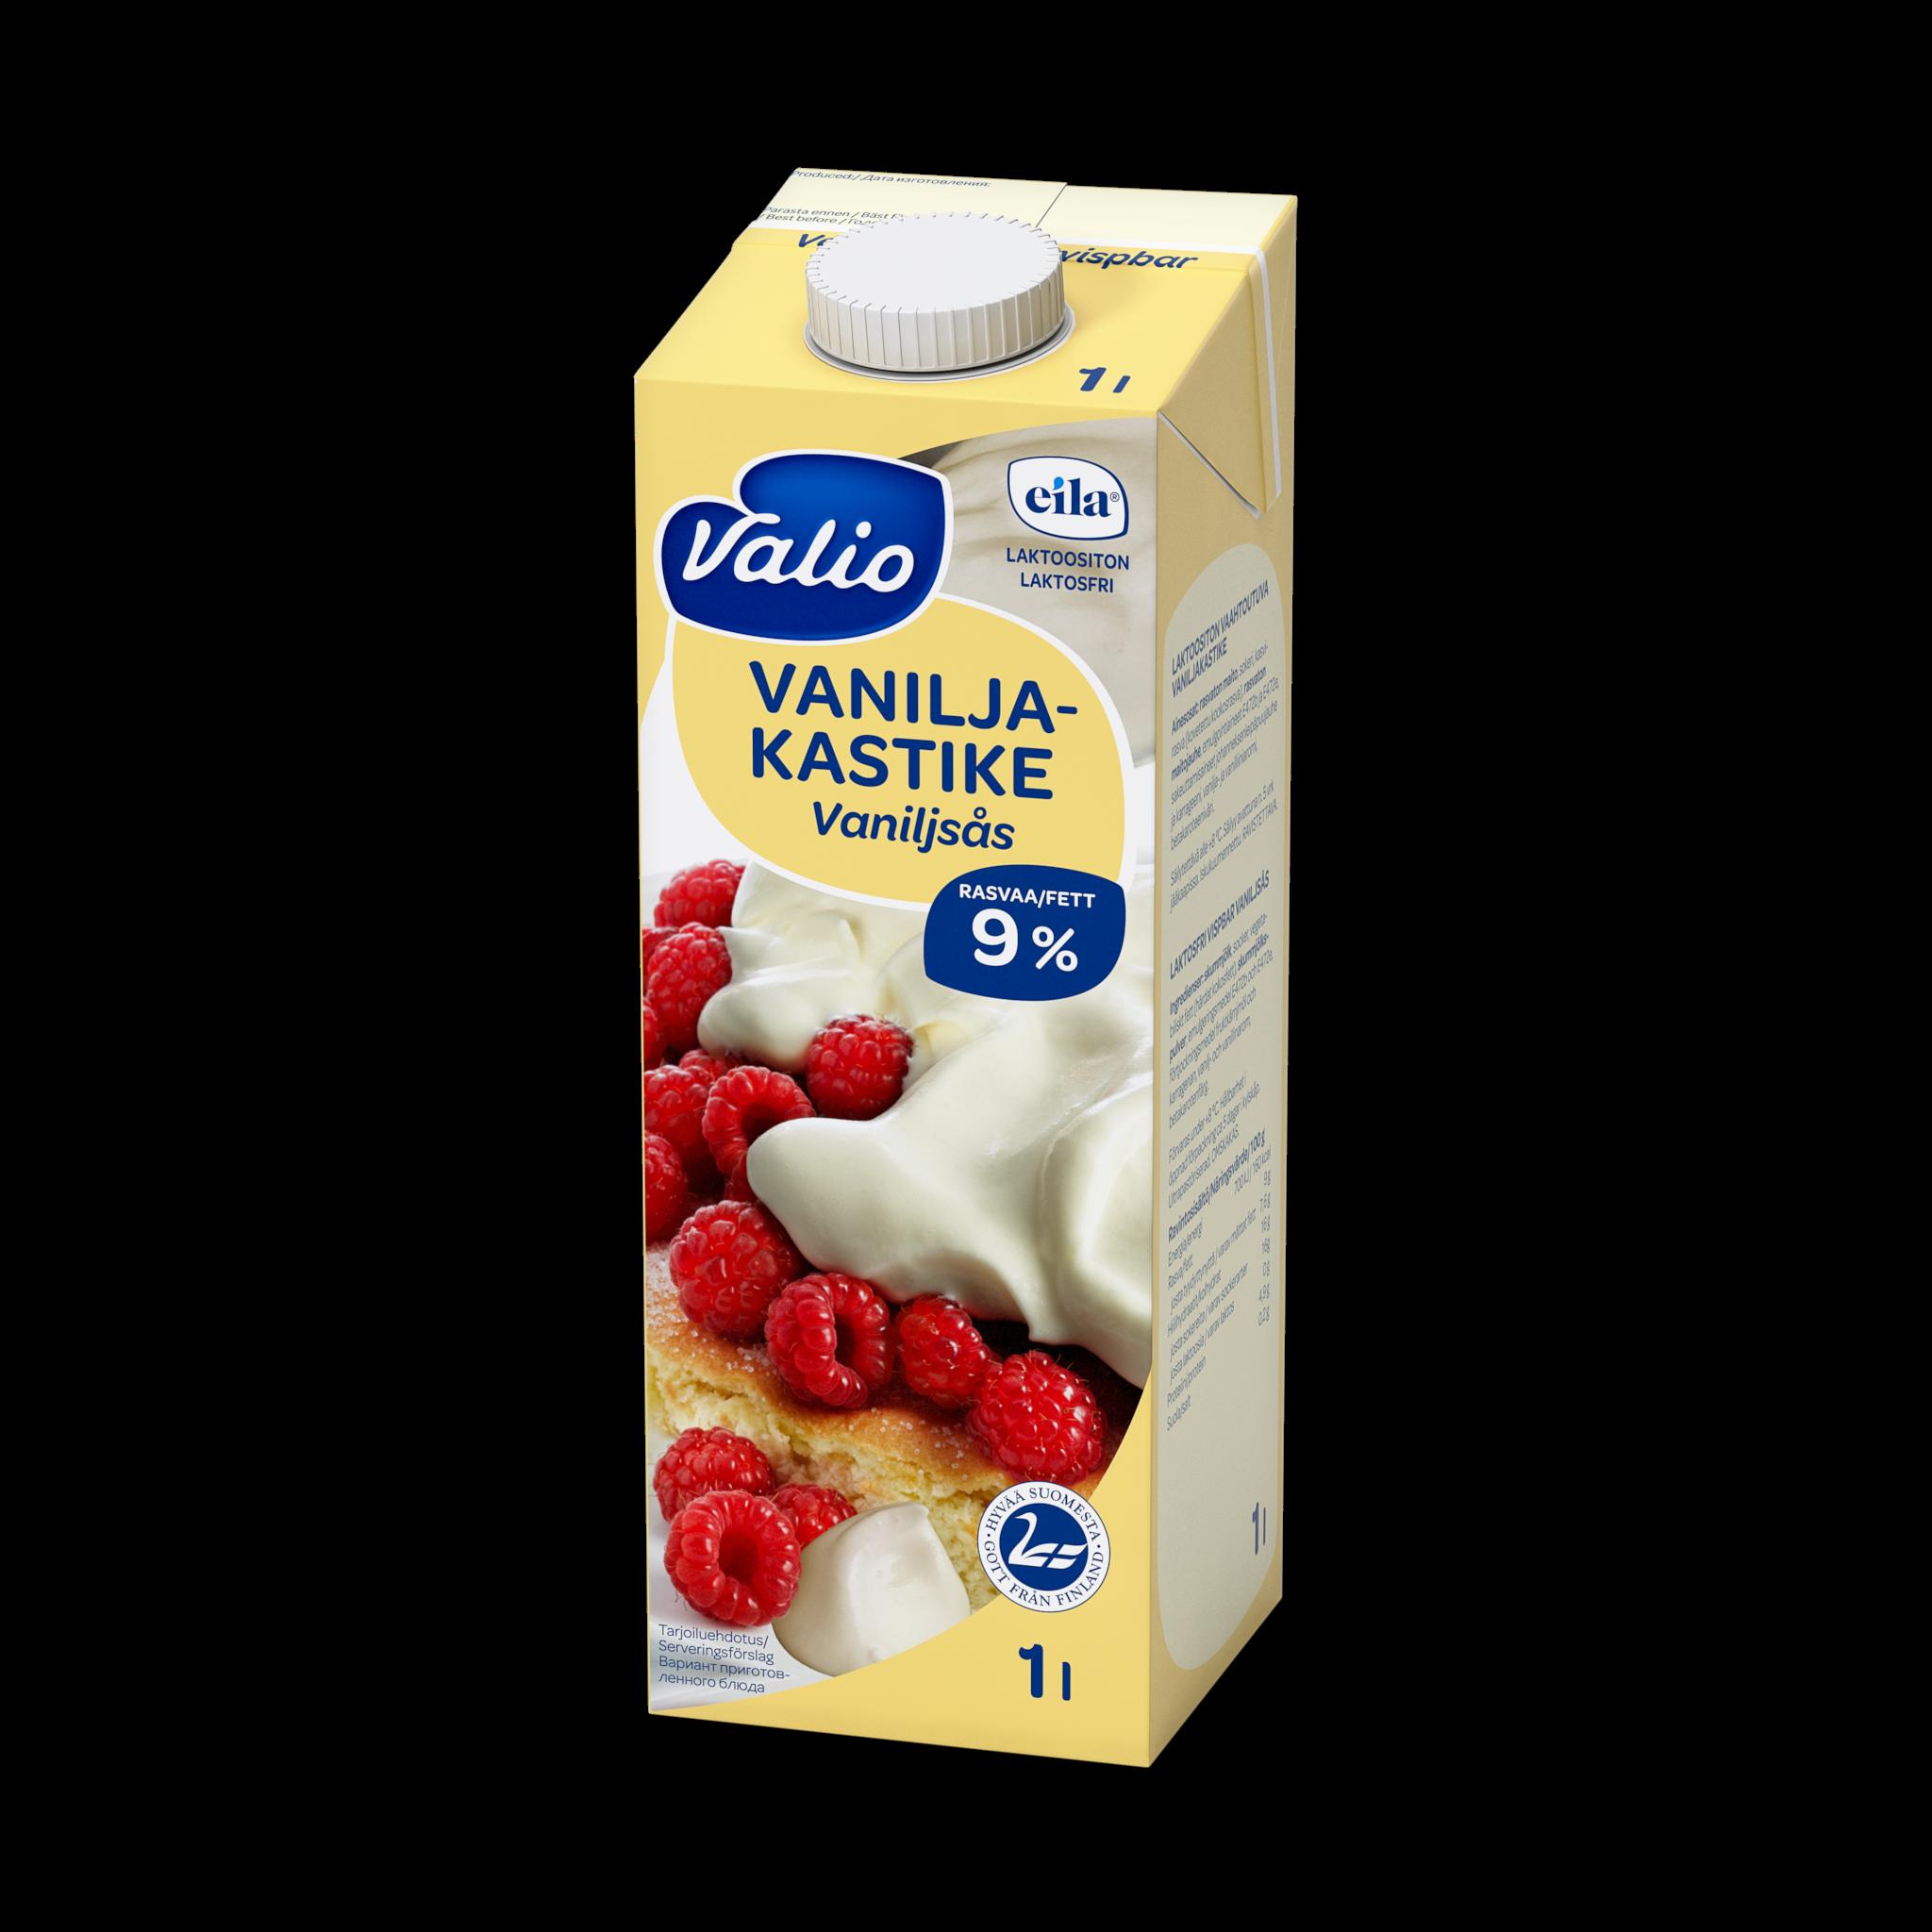 Valio Vaahtoutuva vaniljakastike laktoositon